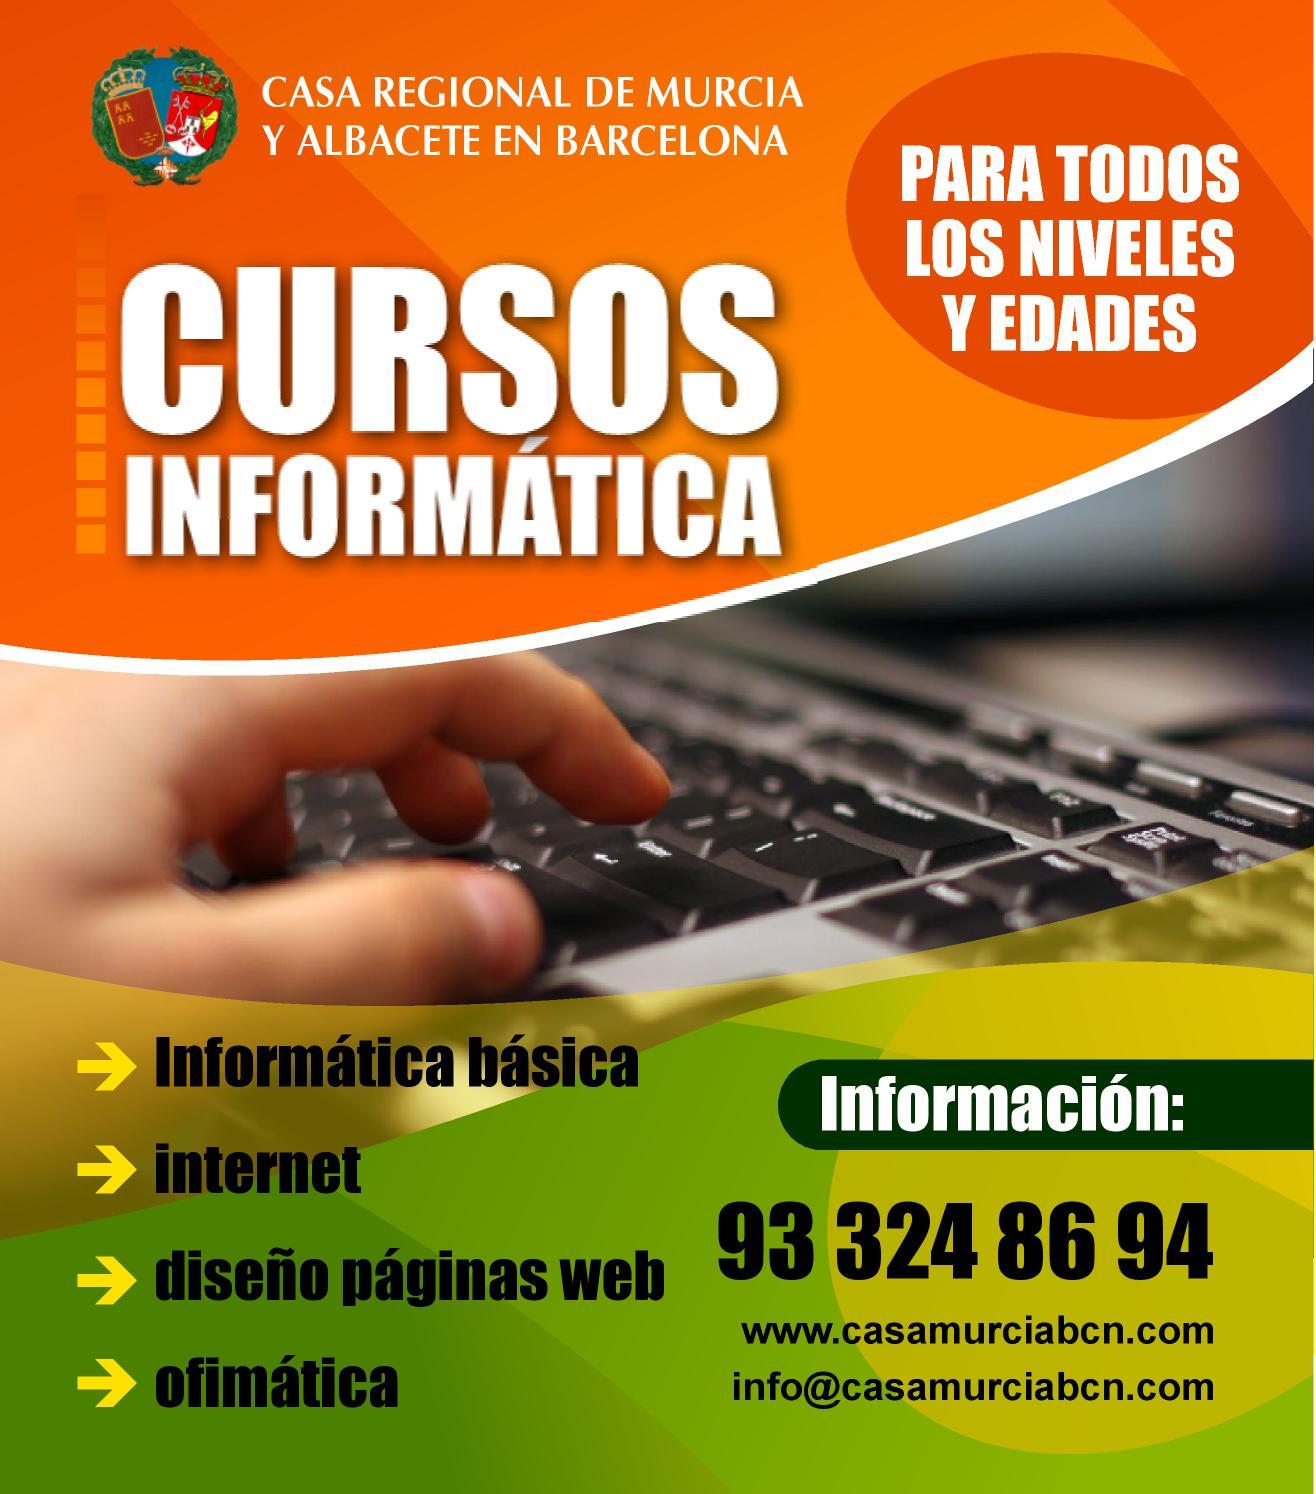 banner_cursos_informatica.jpg